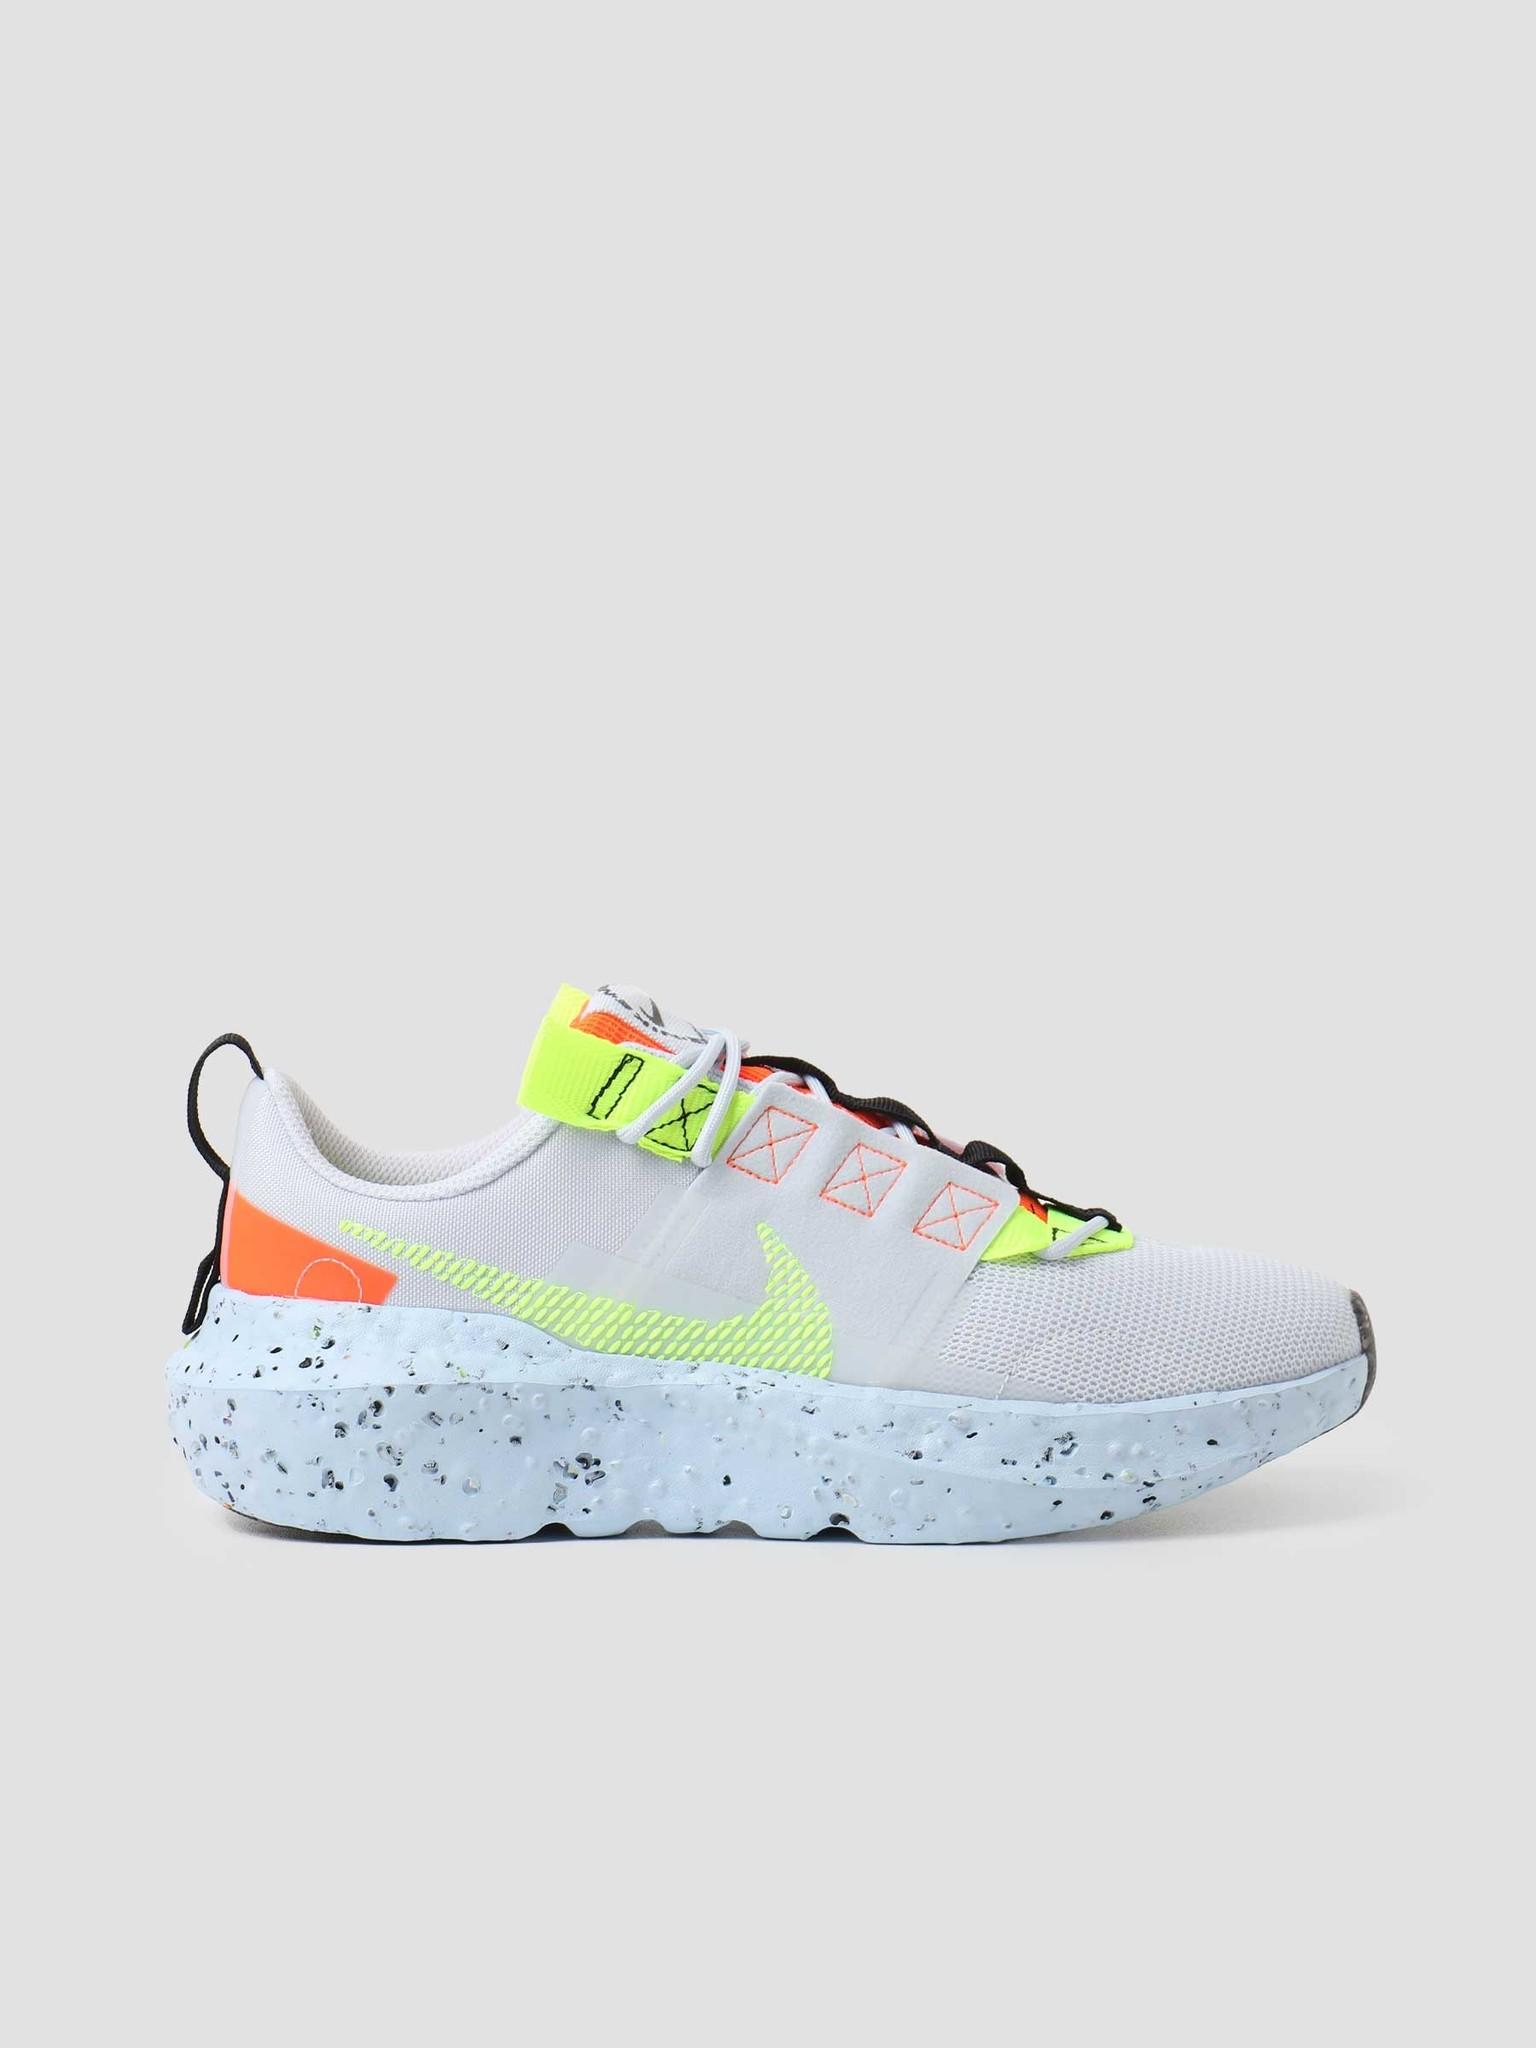 Nike Nike W Nike Crater Impact Football Grey Volt Hyper Crimson Black CW2386-002